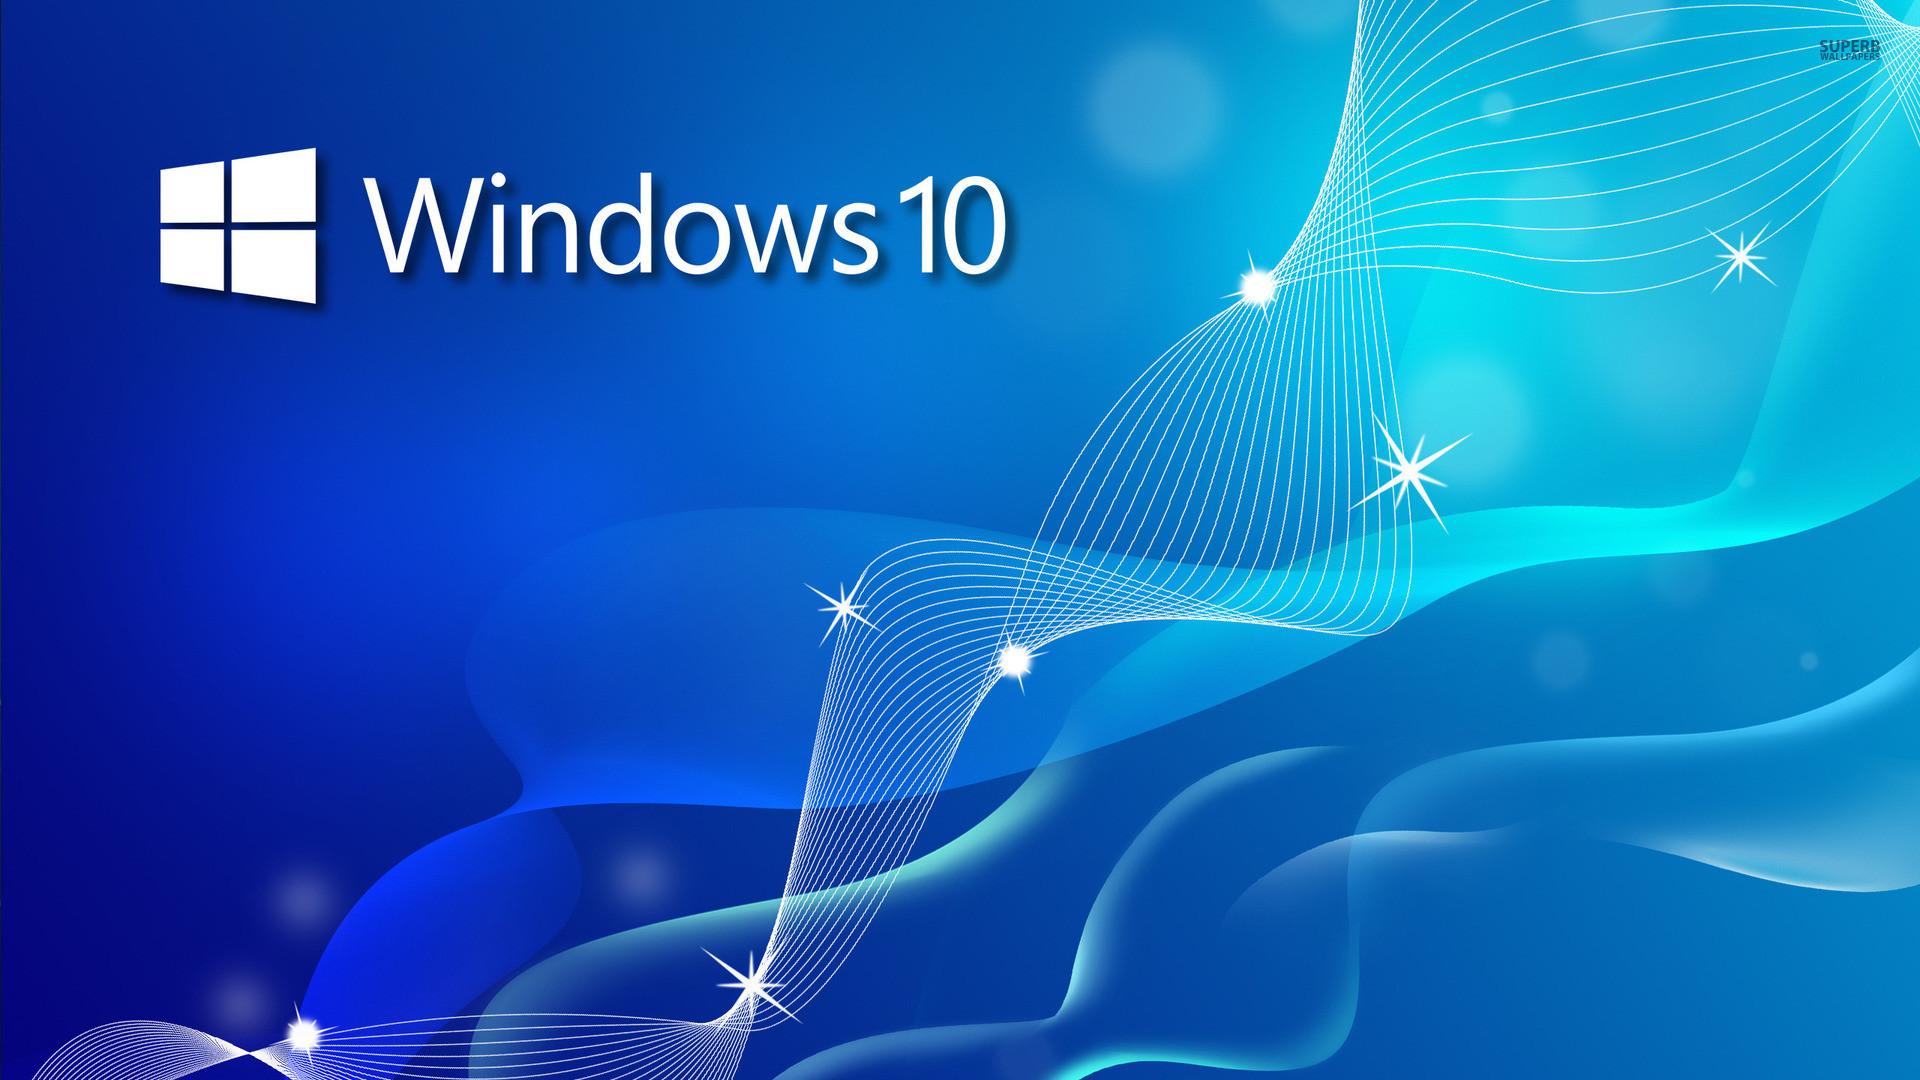 Sfondi Desktop Windows 10 77 Immagini